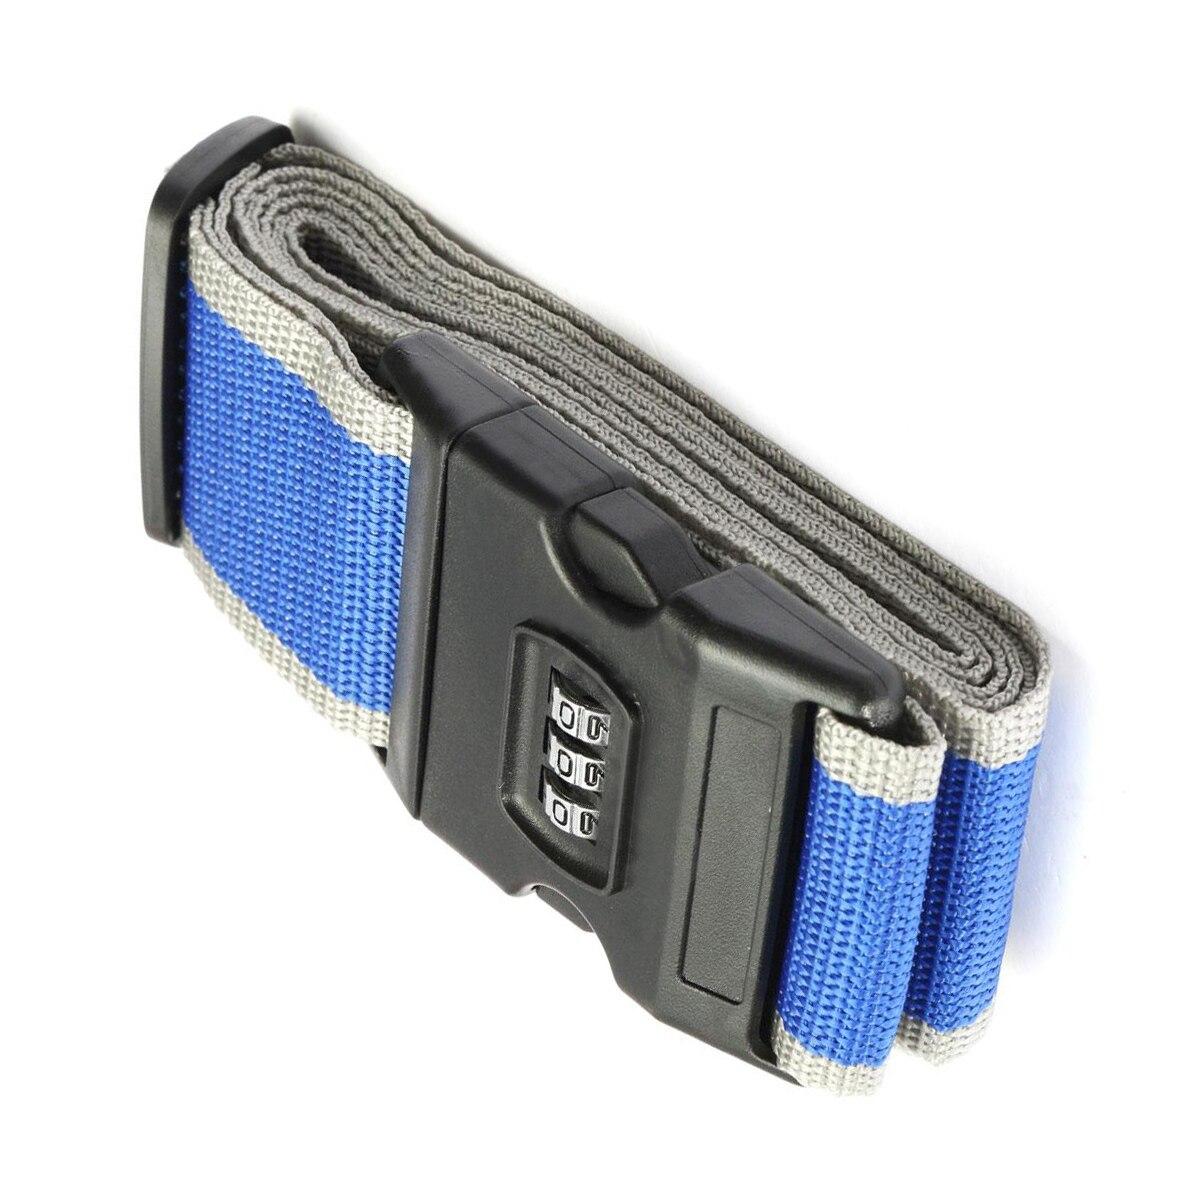 Safety belt Belt Lock Combination Travel Luggage Suitcase band color:Blue + Grey maritime safety